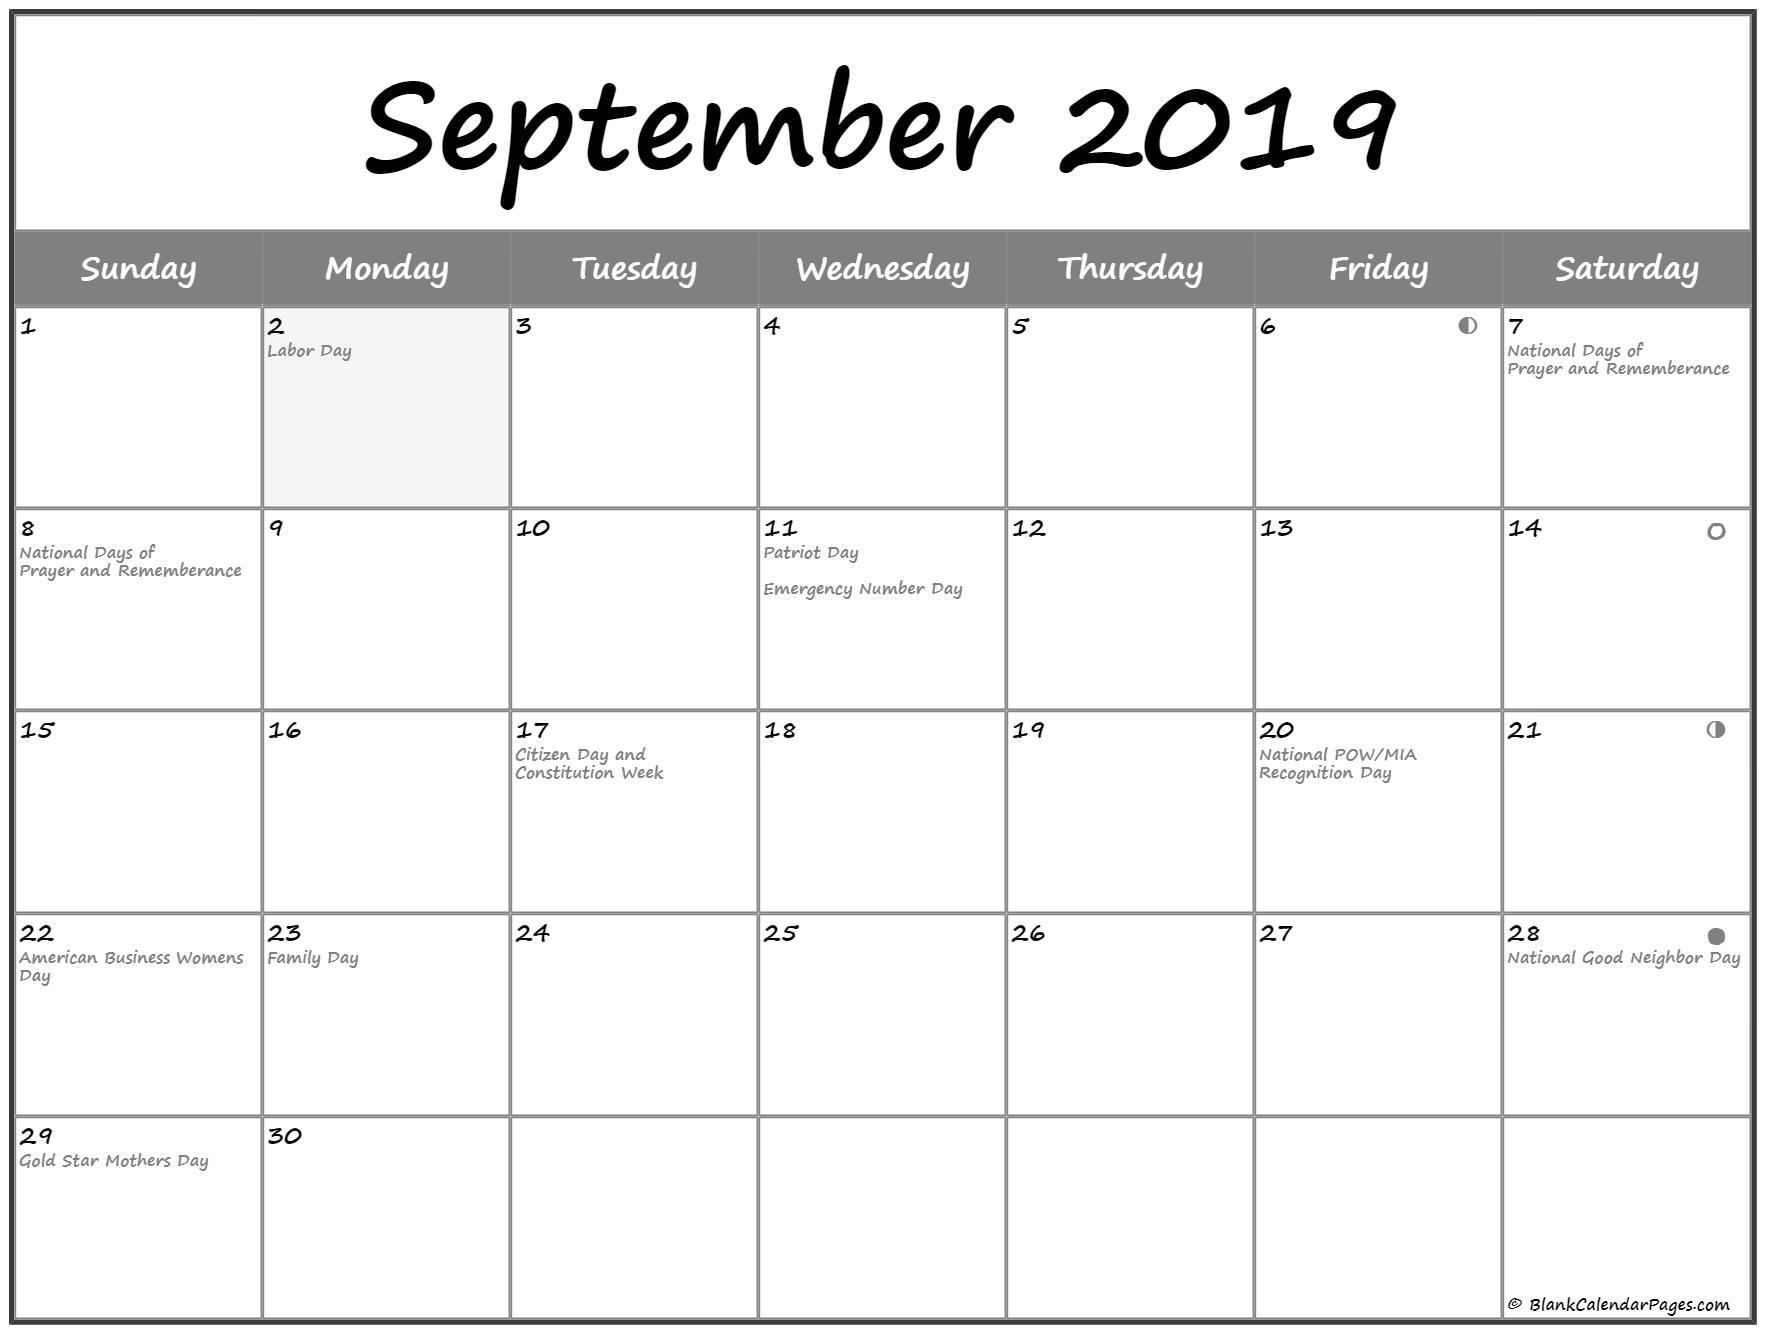 September 2019 Lunar Calendar | Moon Phase Calendar